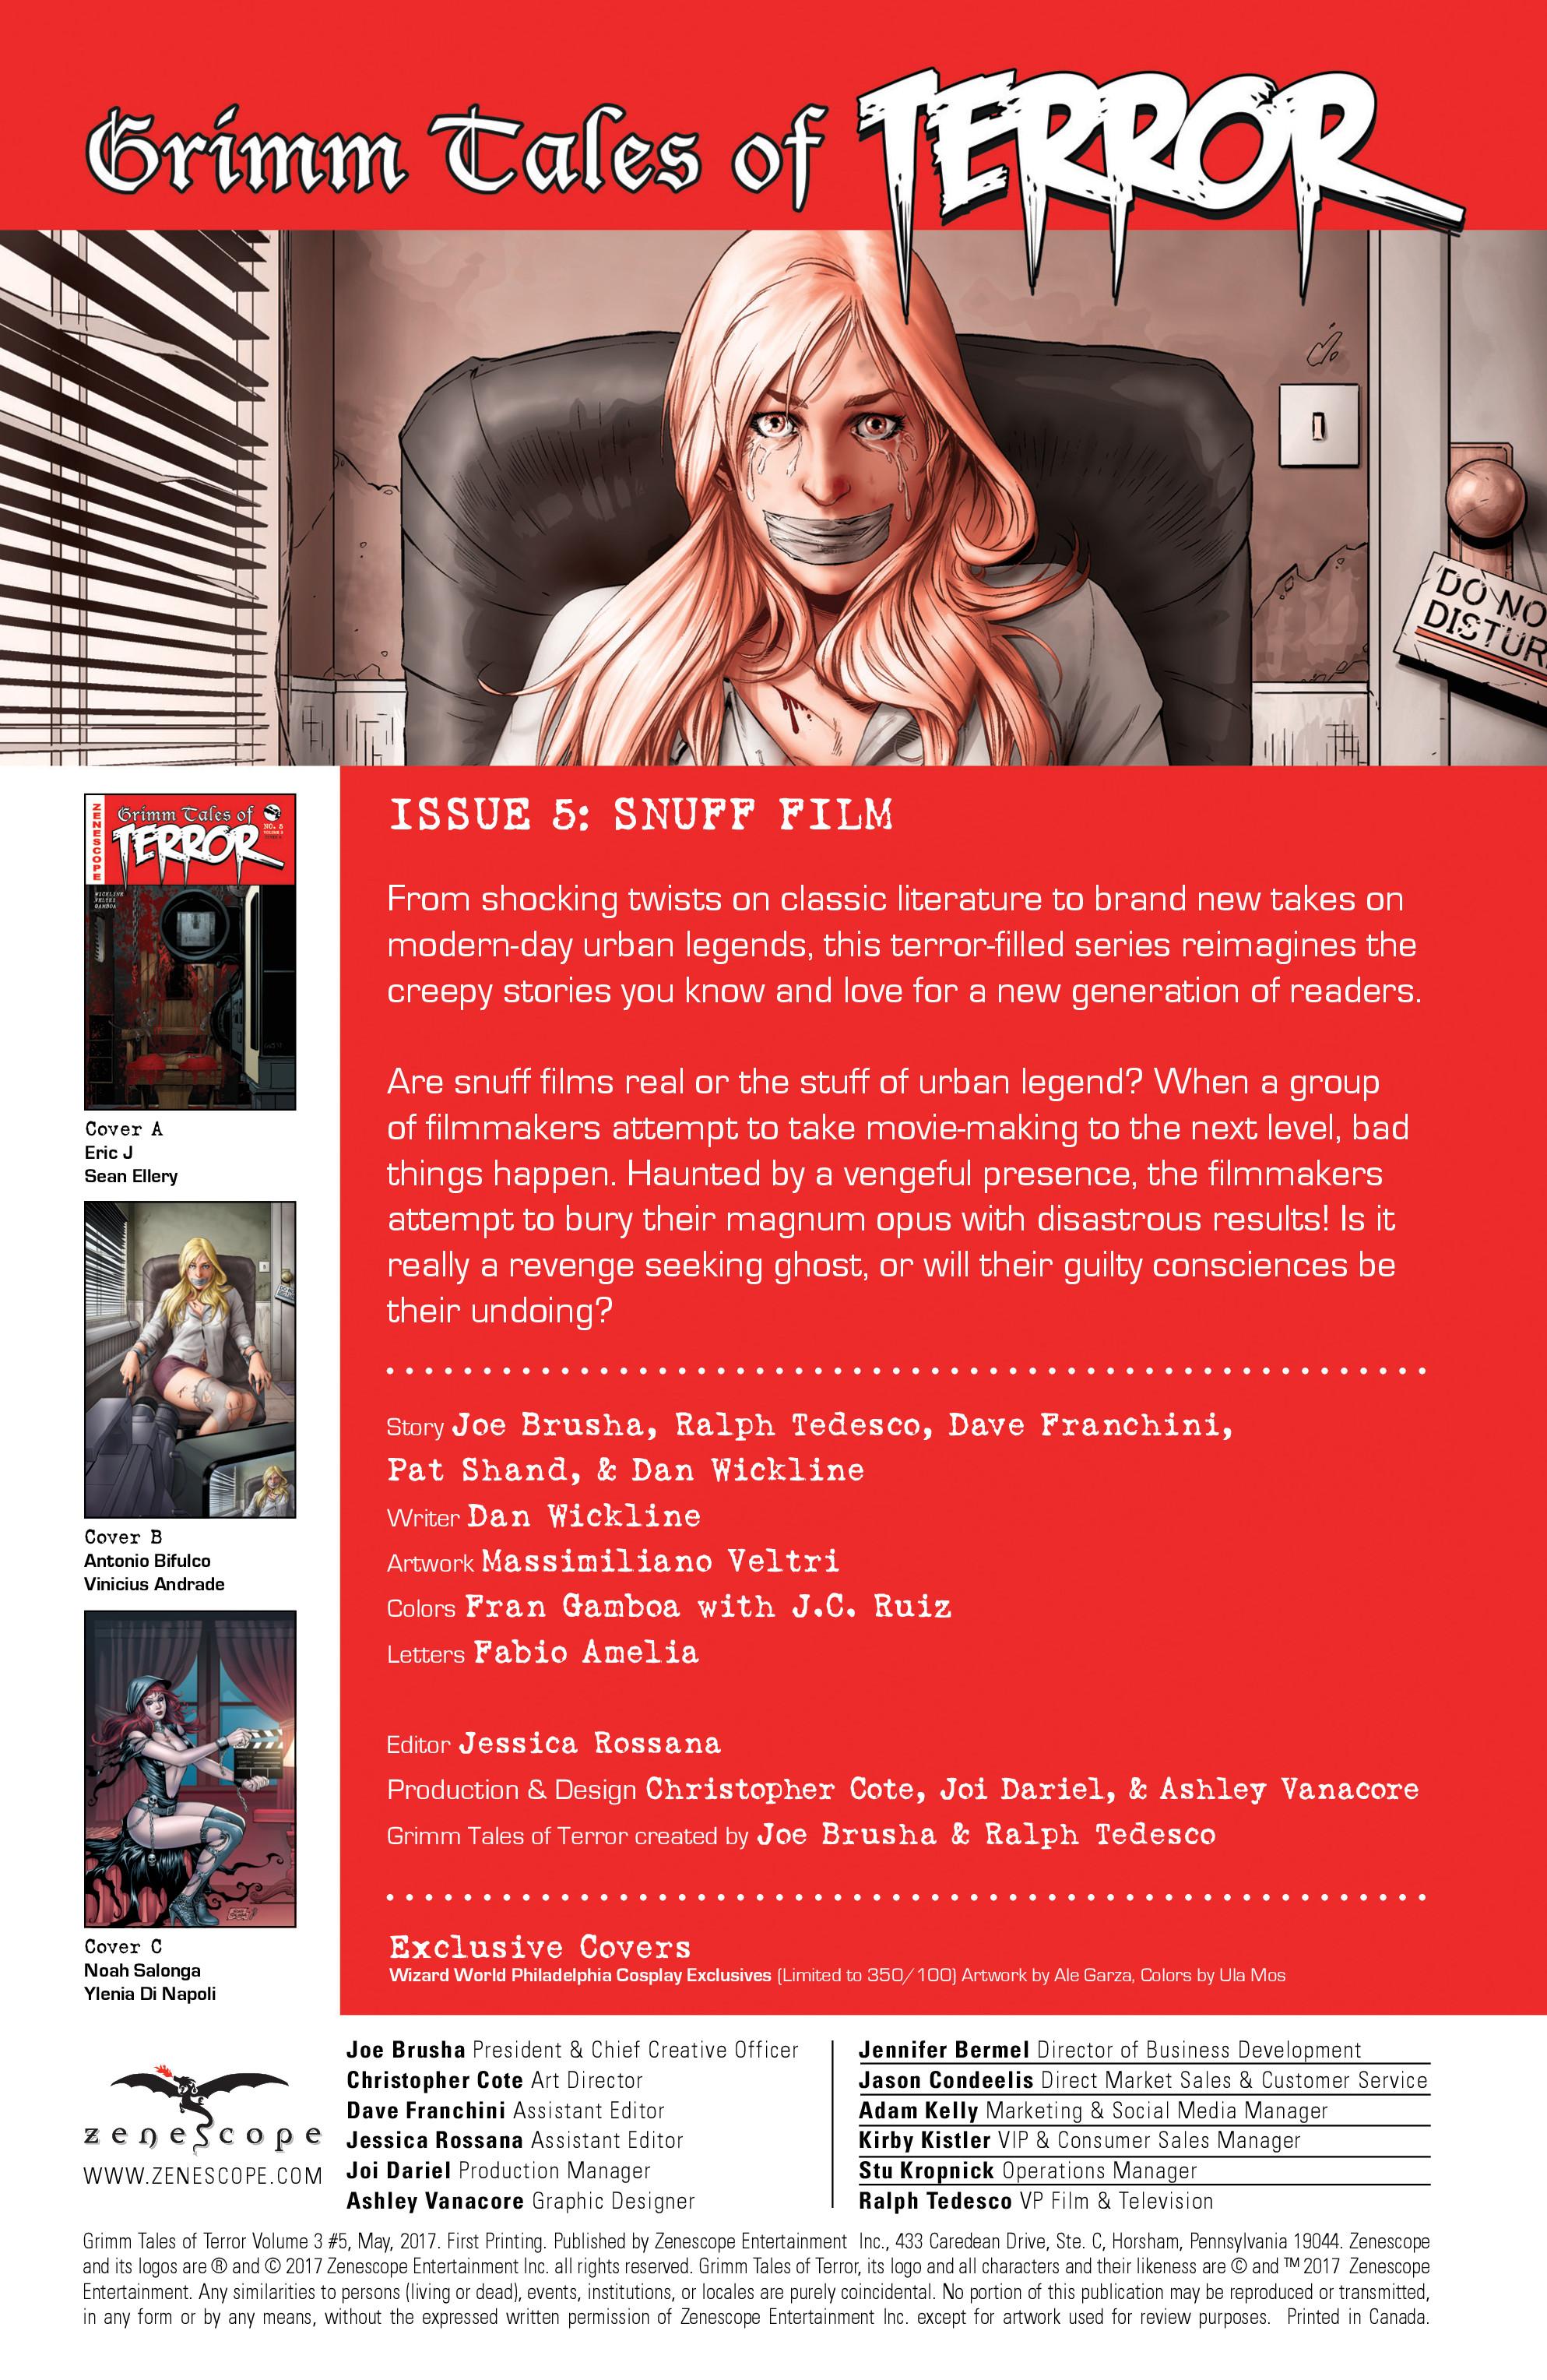 Read online Grimm Tales of Terror: Vol. 3 comic -  Issue #5 - 2